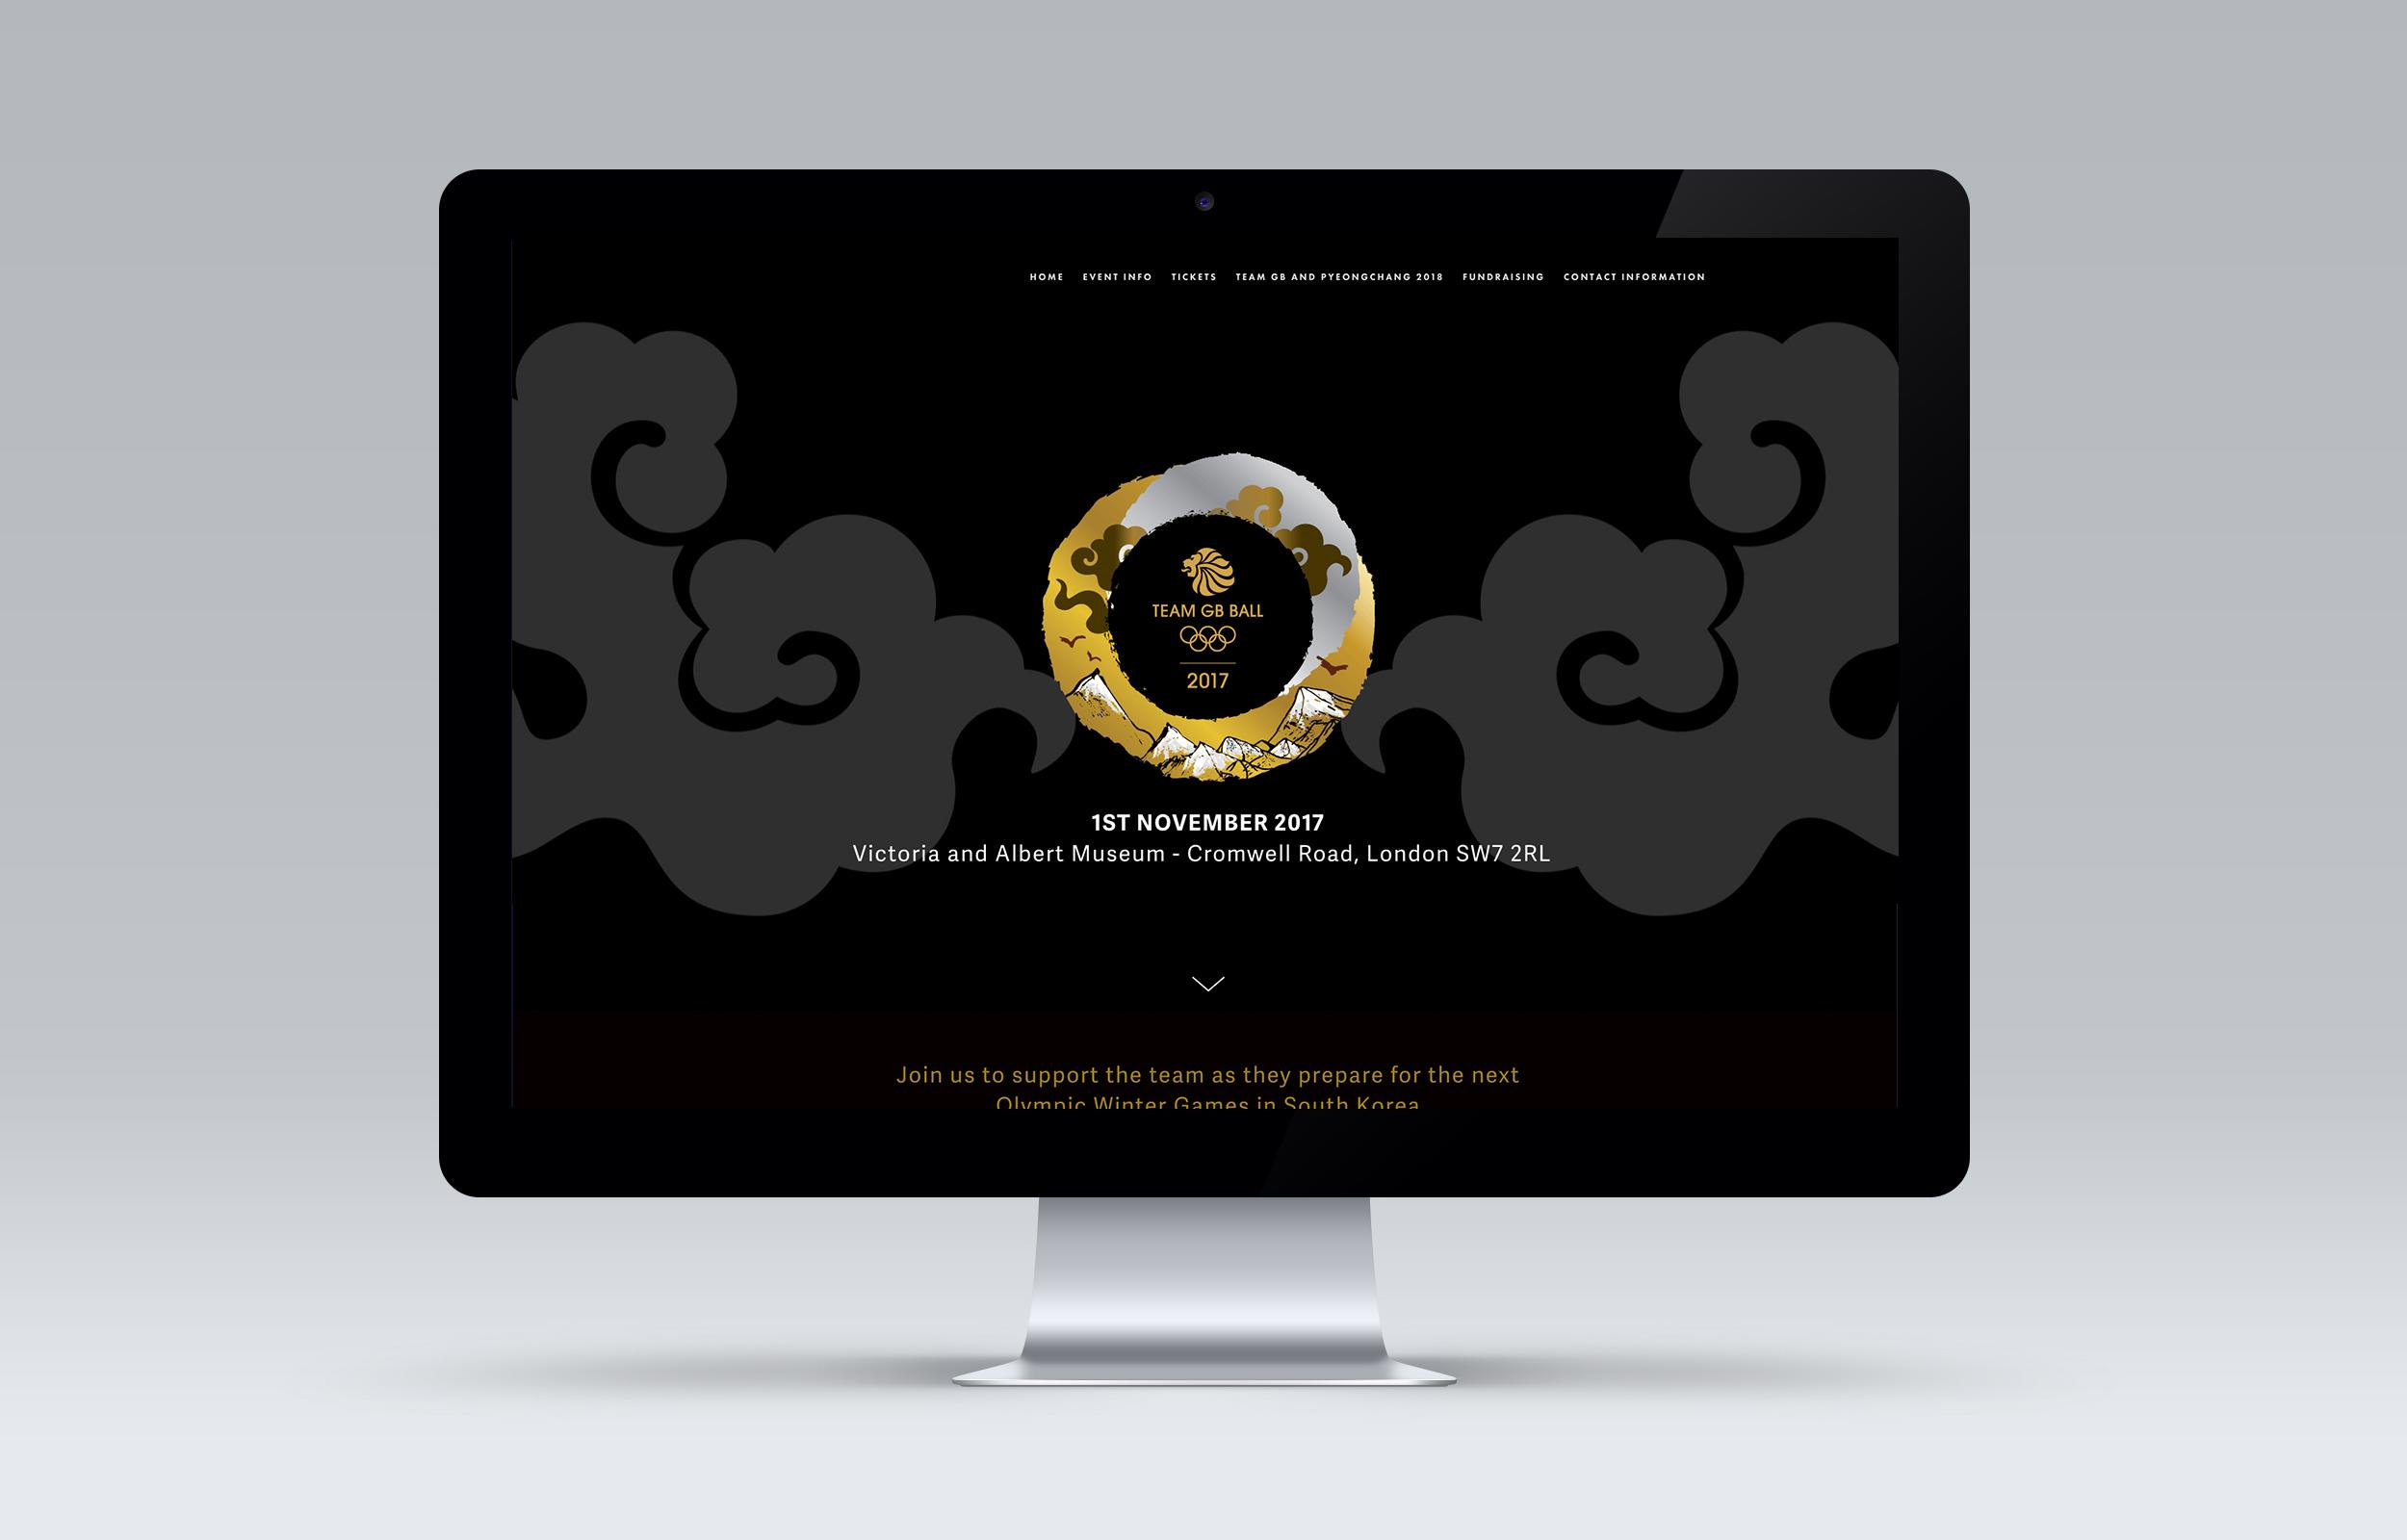 Desktop view of the Team GB Ball website